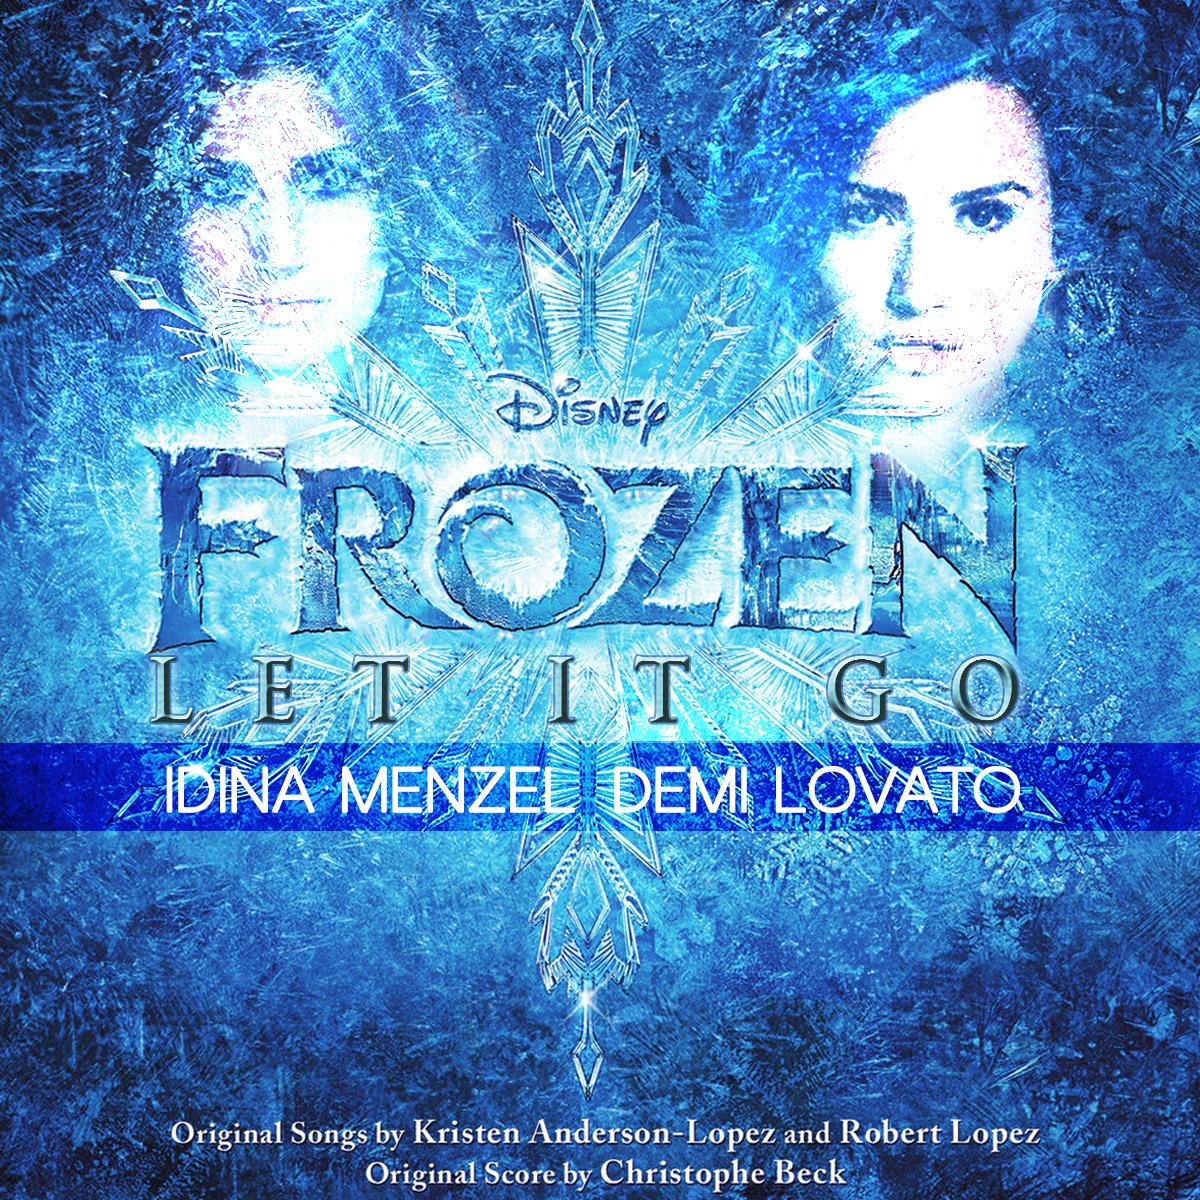 UKMIX • View topic - Idina Menzel / Demi Lovato - Let It Go